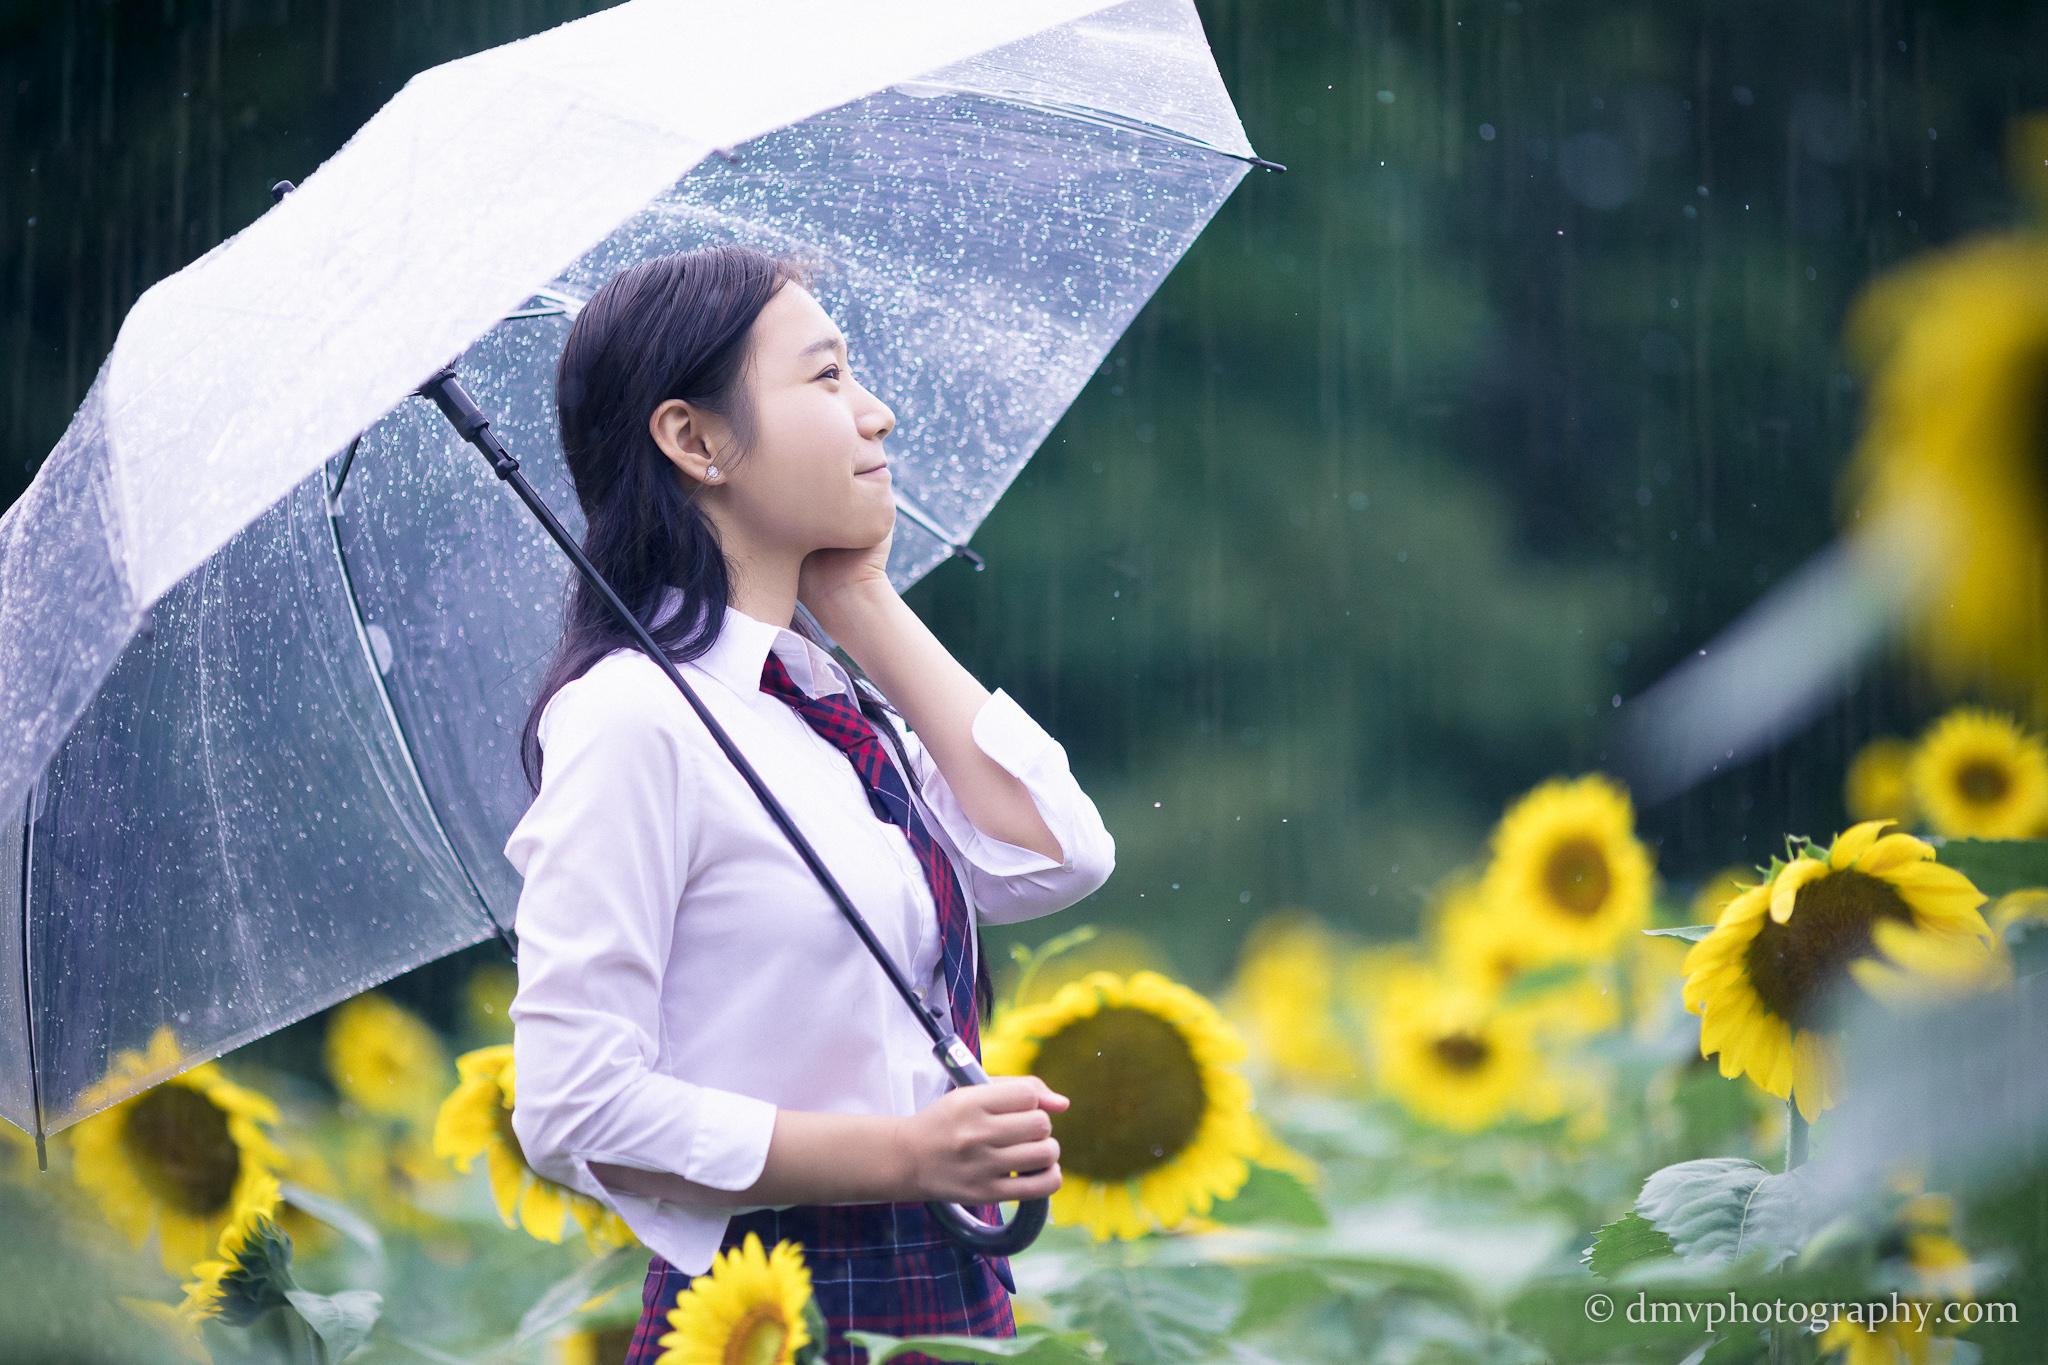 2017-07-29 - Yu Jie Sunflower - 00007